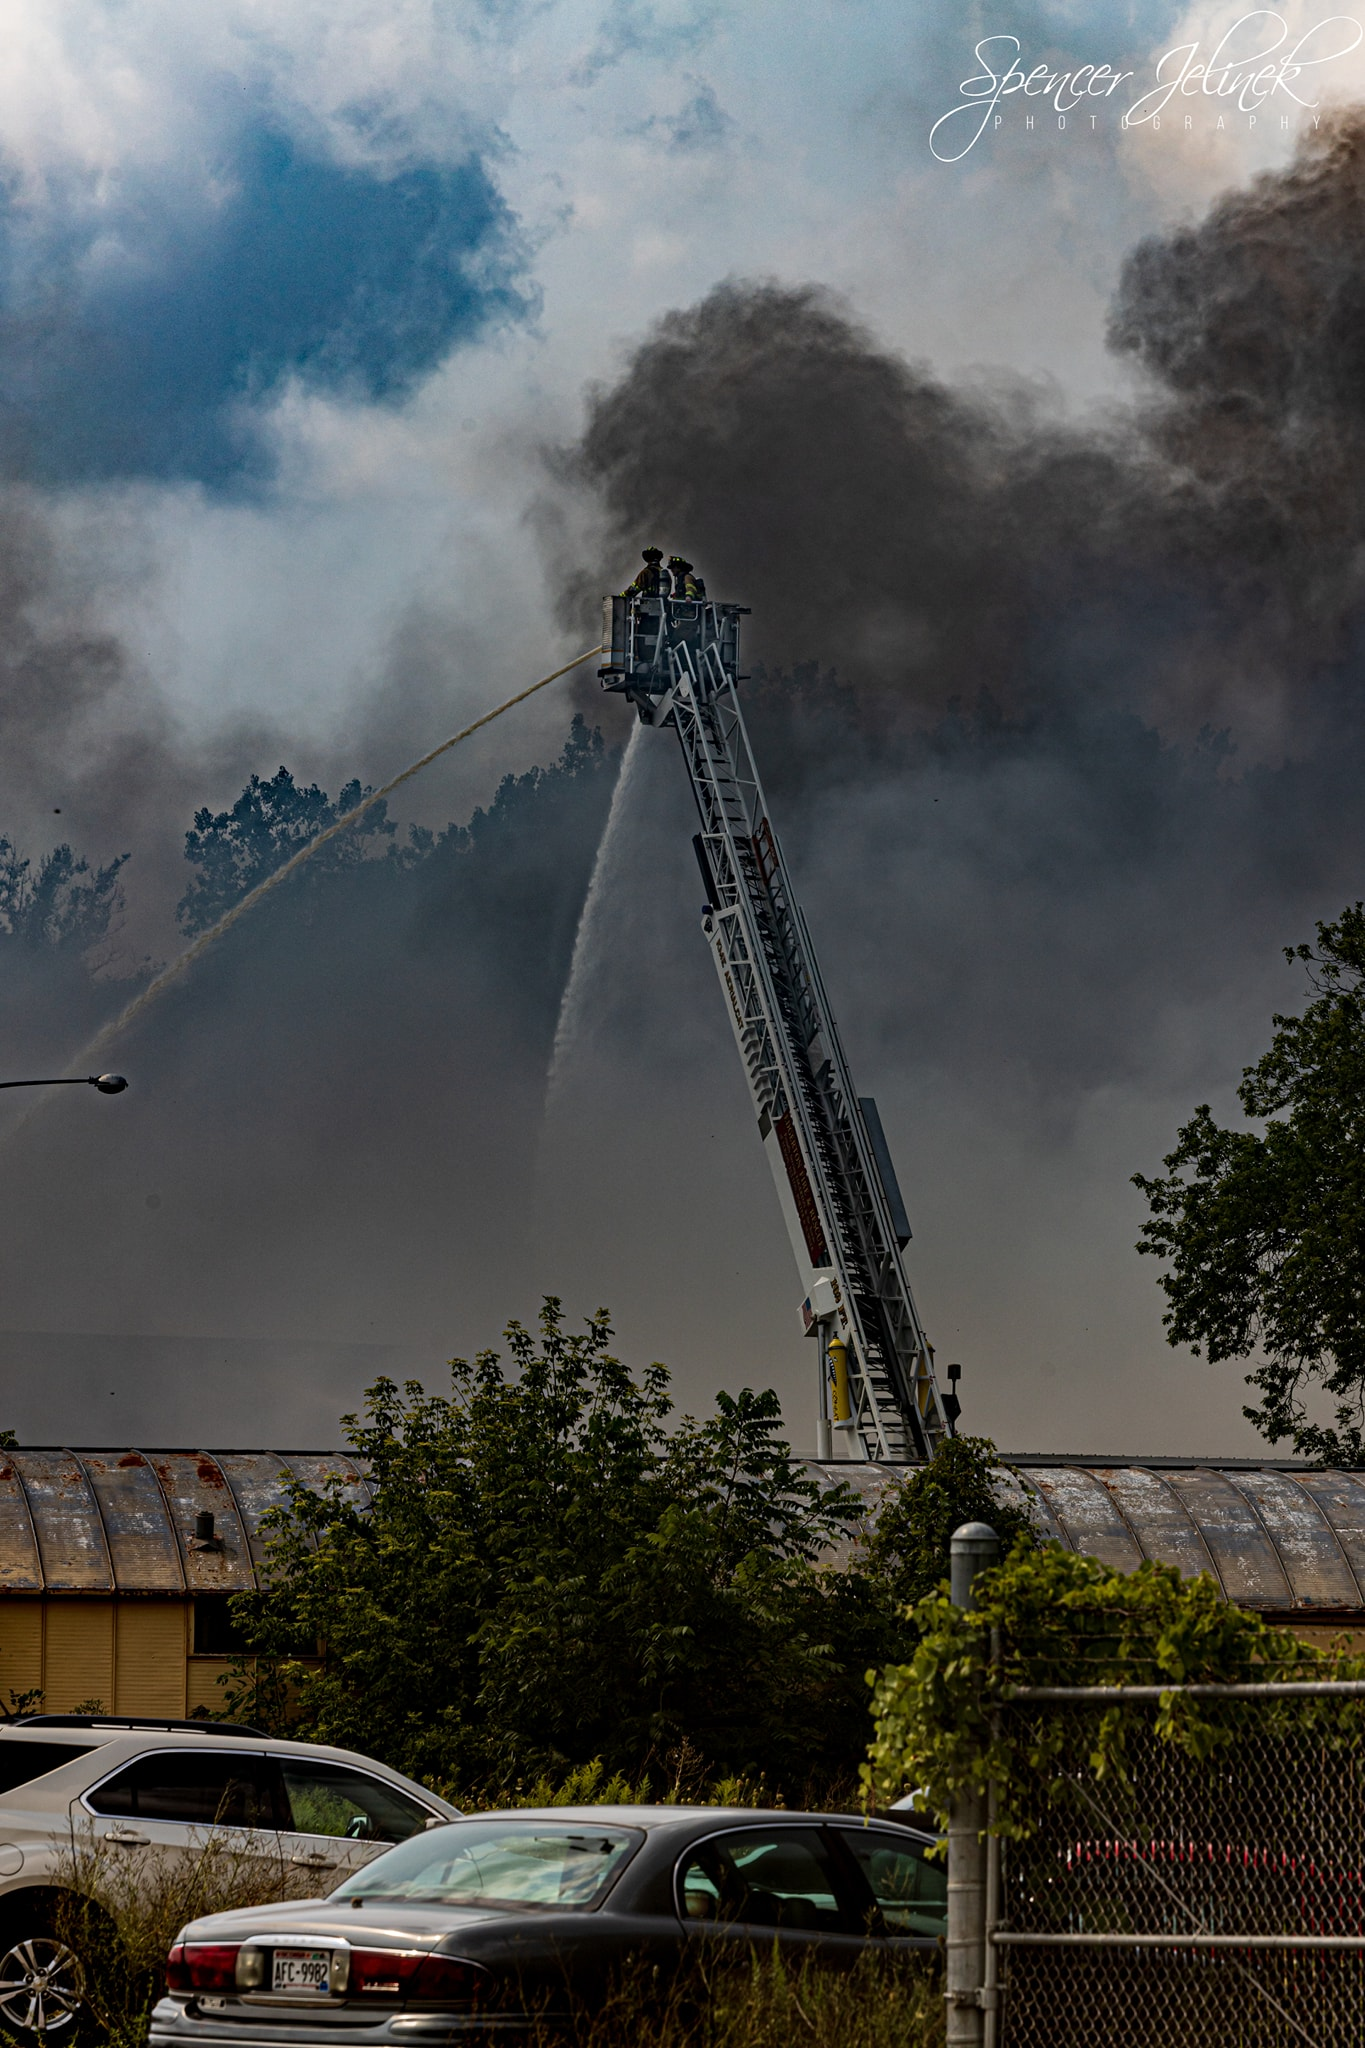 Ladder Use at Industrial Emergencies